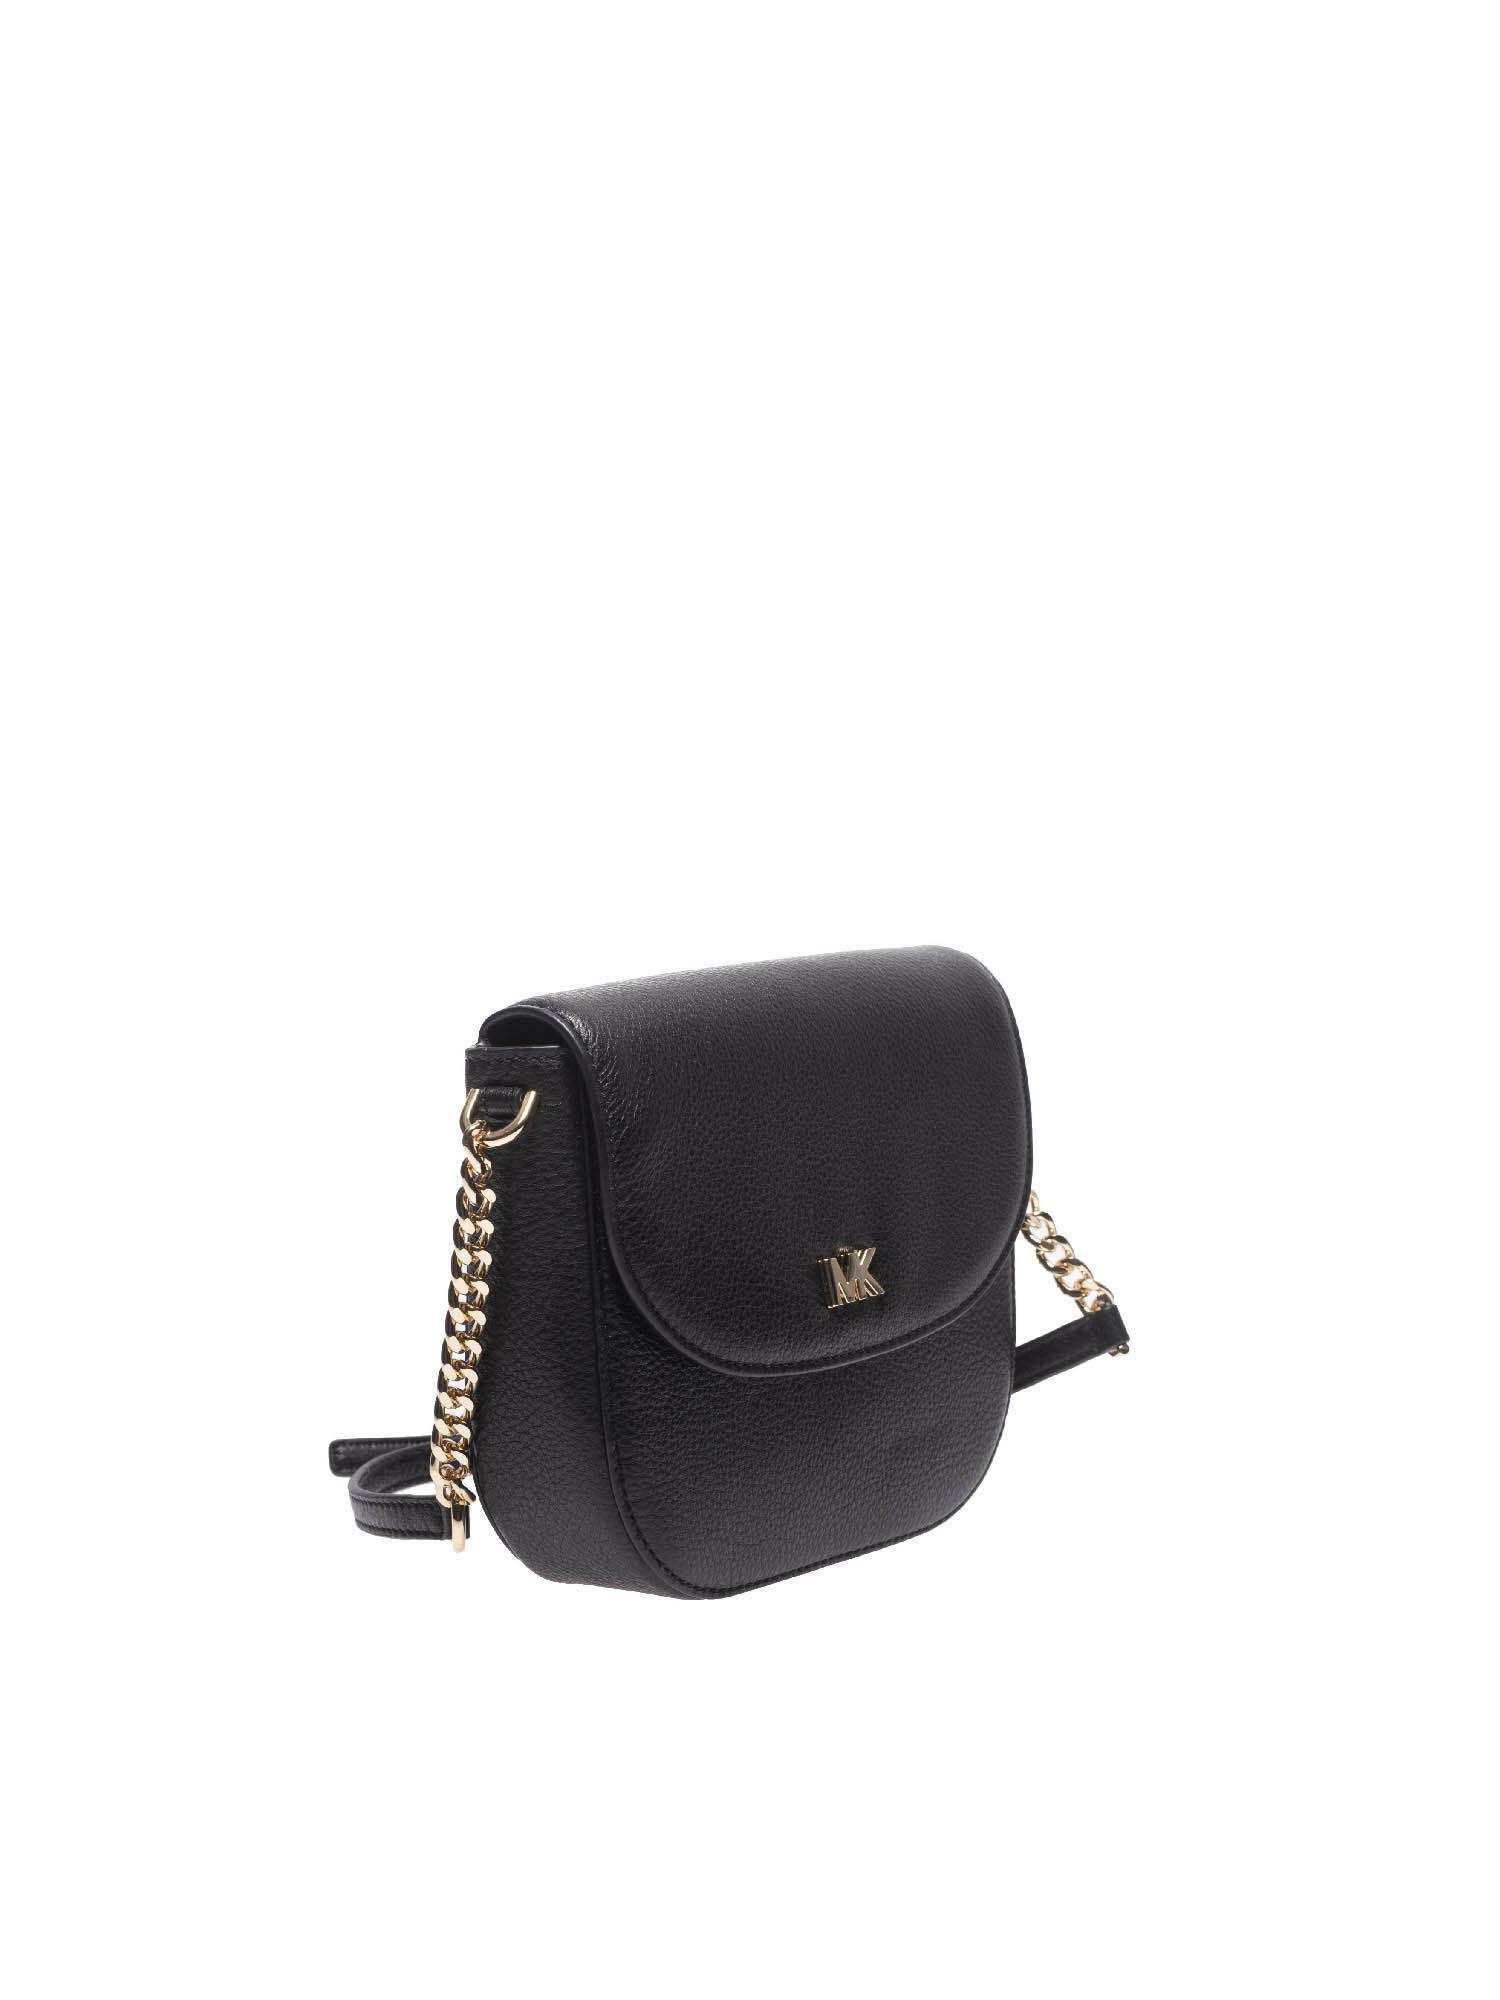 20ddc8a649ab4 Michael Kors Black Leather Shoulder Bag With Logo in Black - Lyst